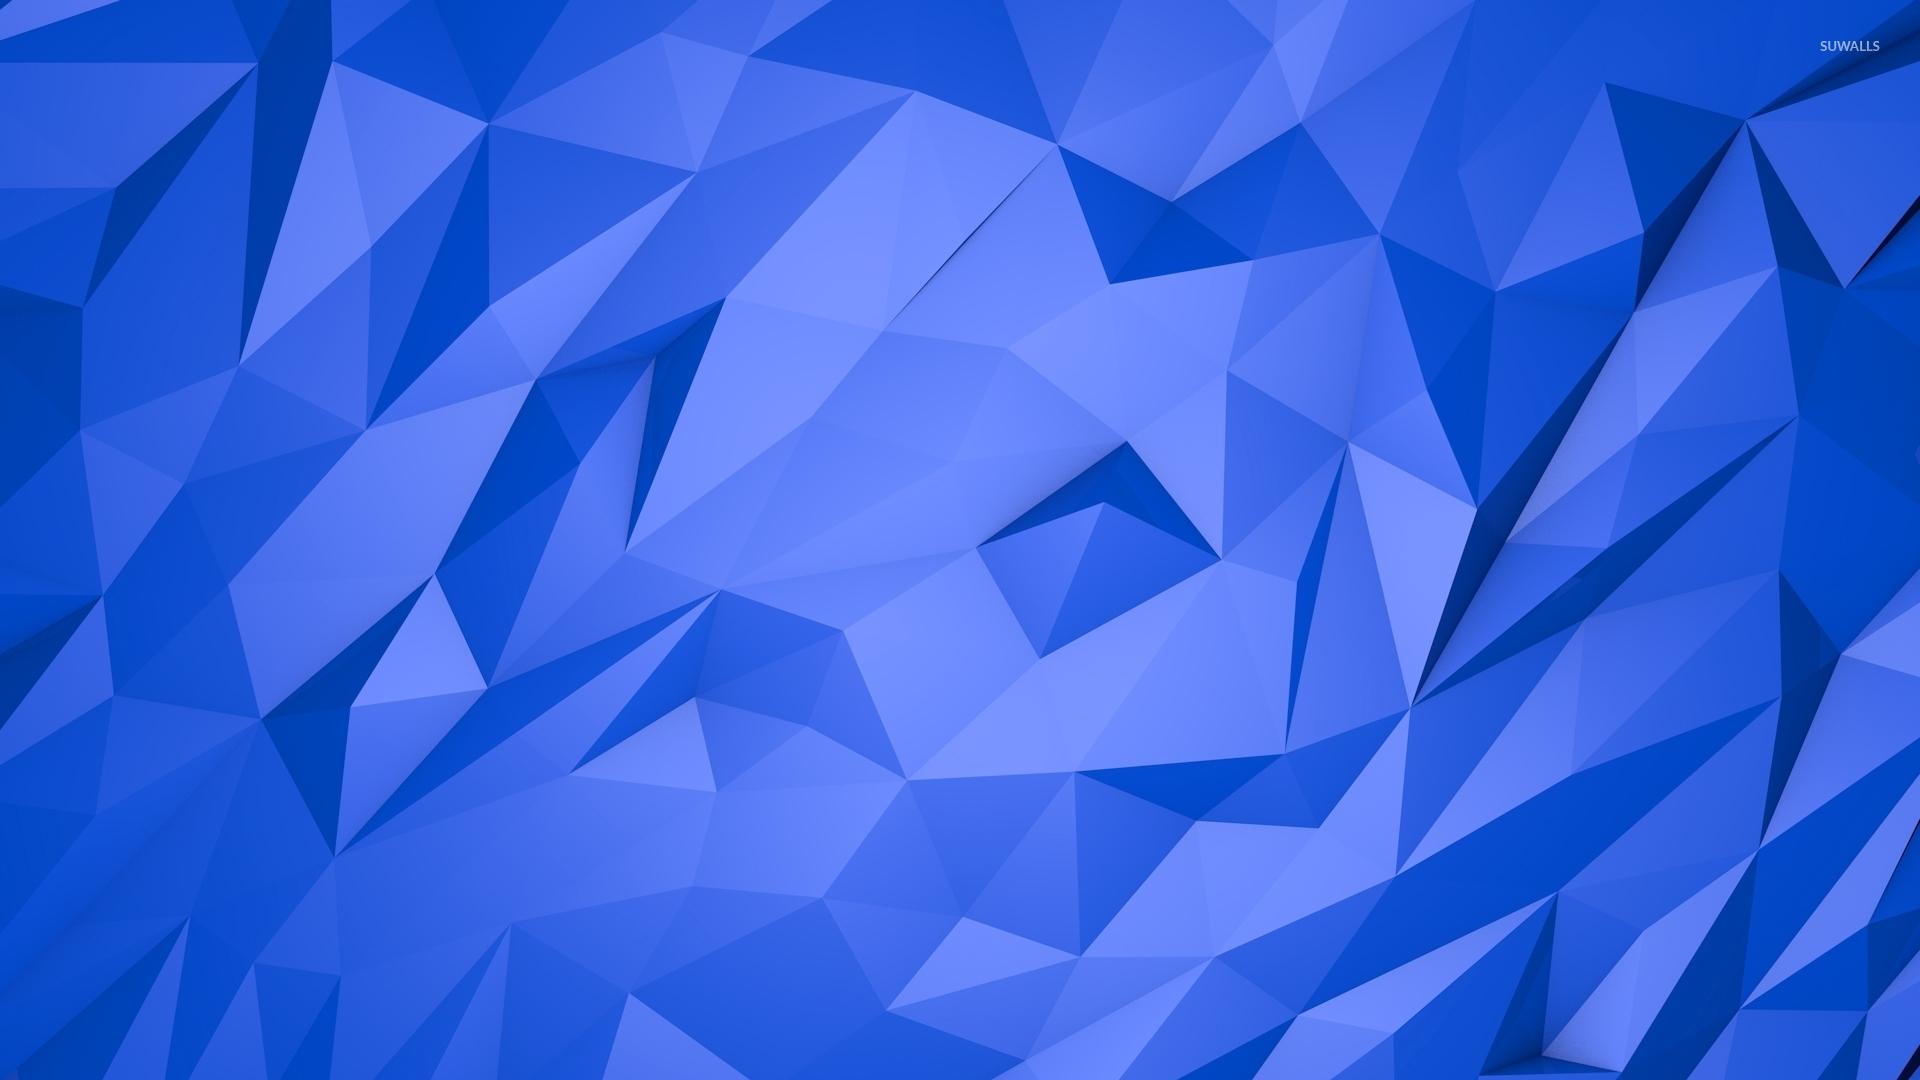 Blue Pyramids Wallpaper Abstract Wallpapers 51639